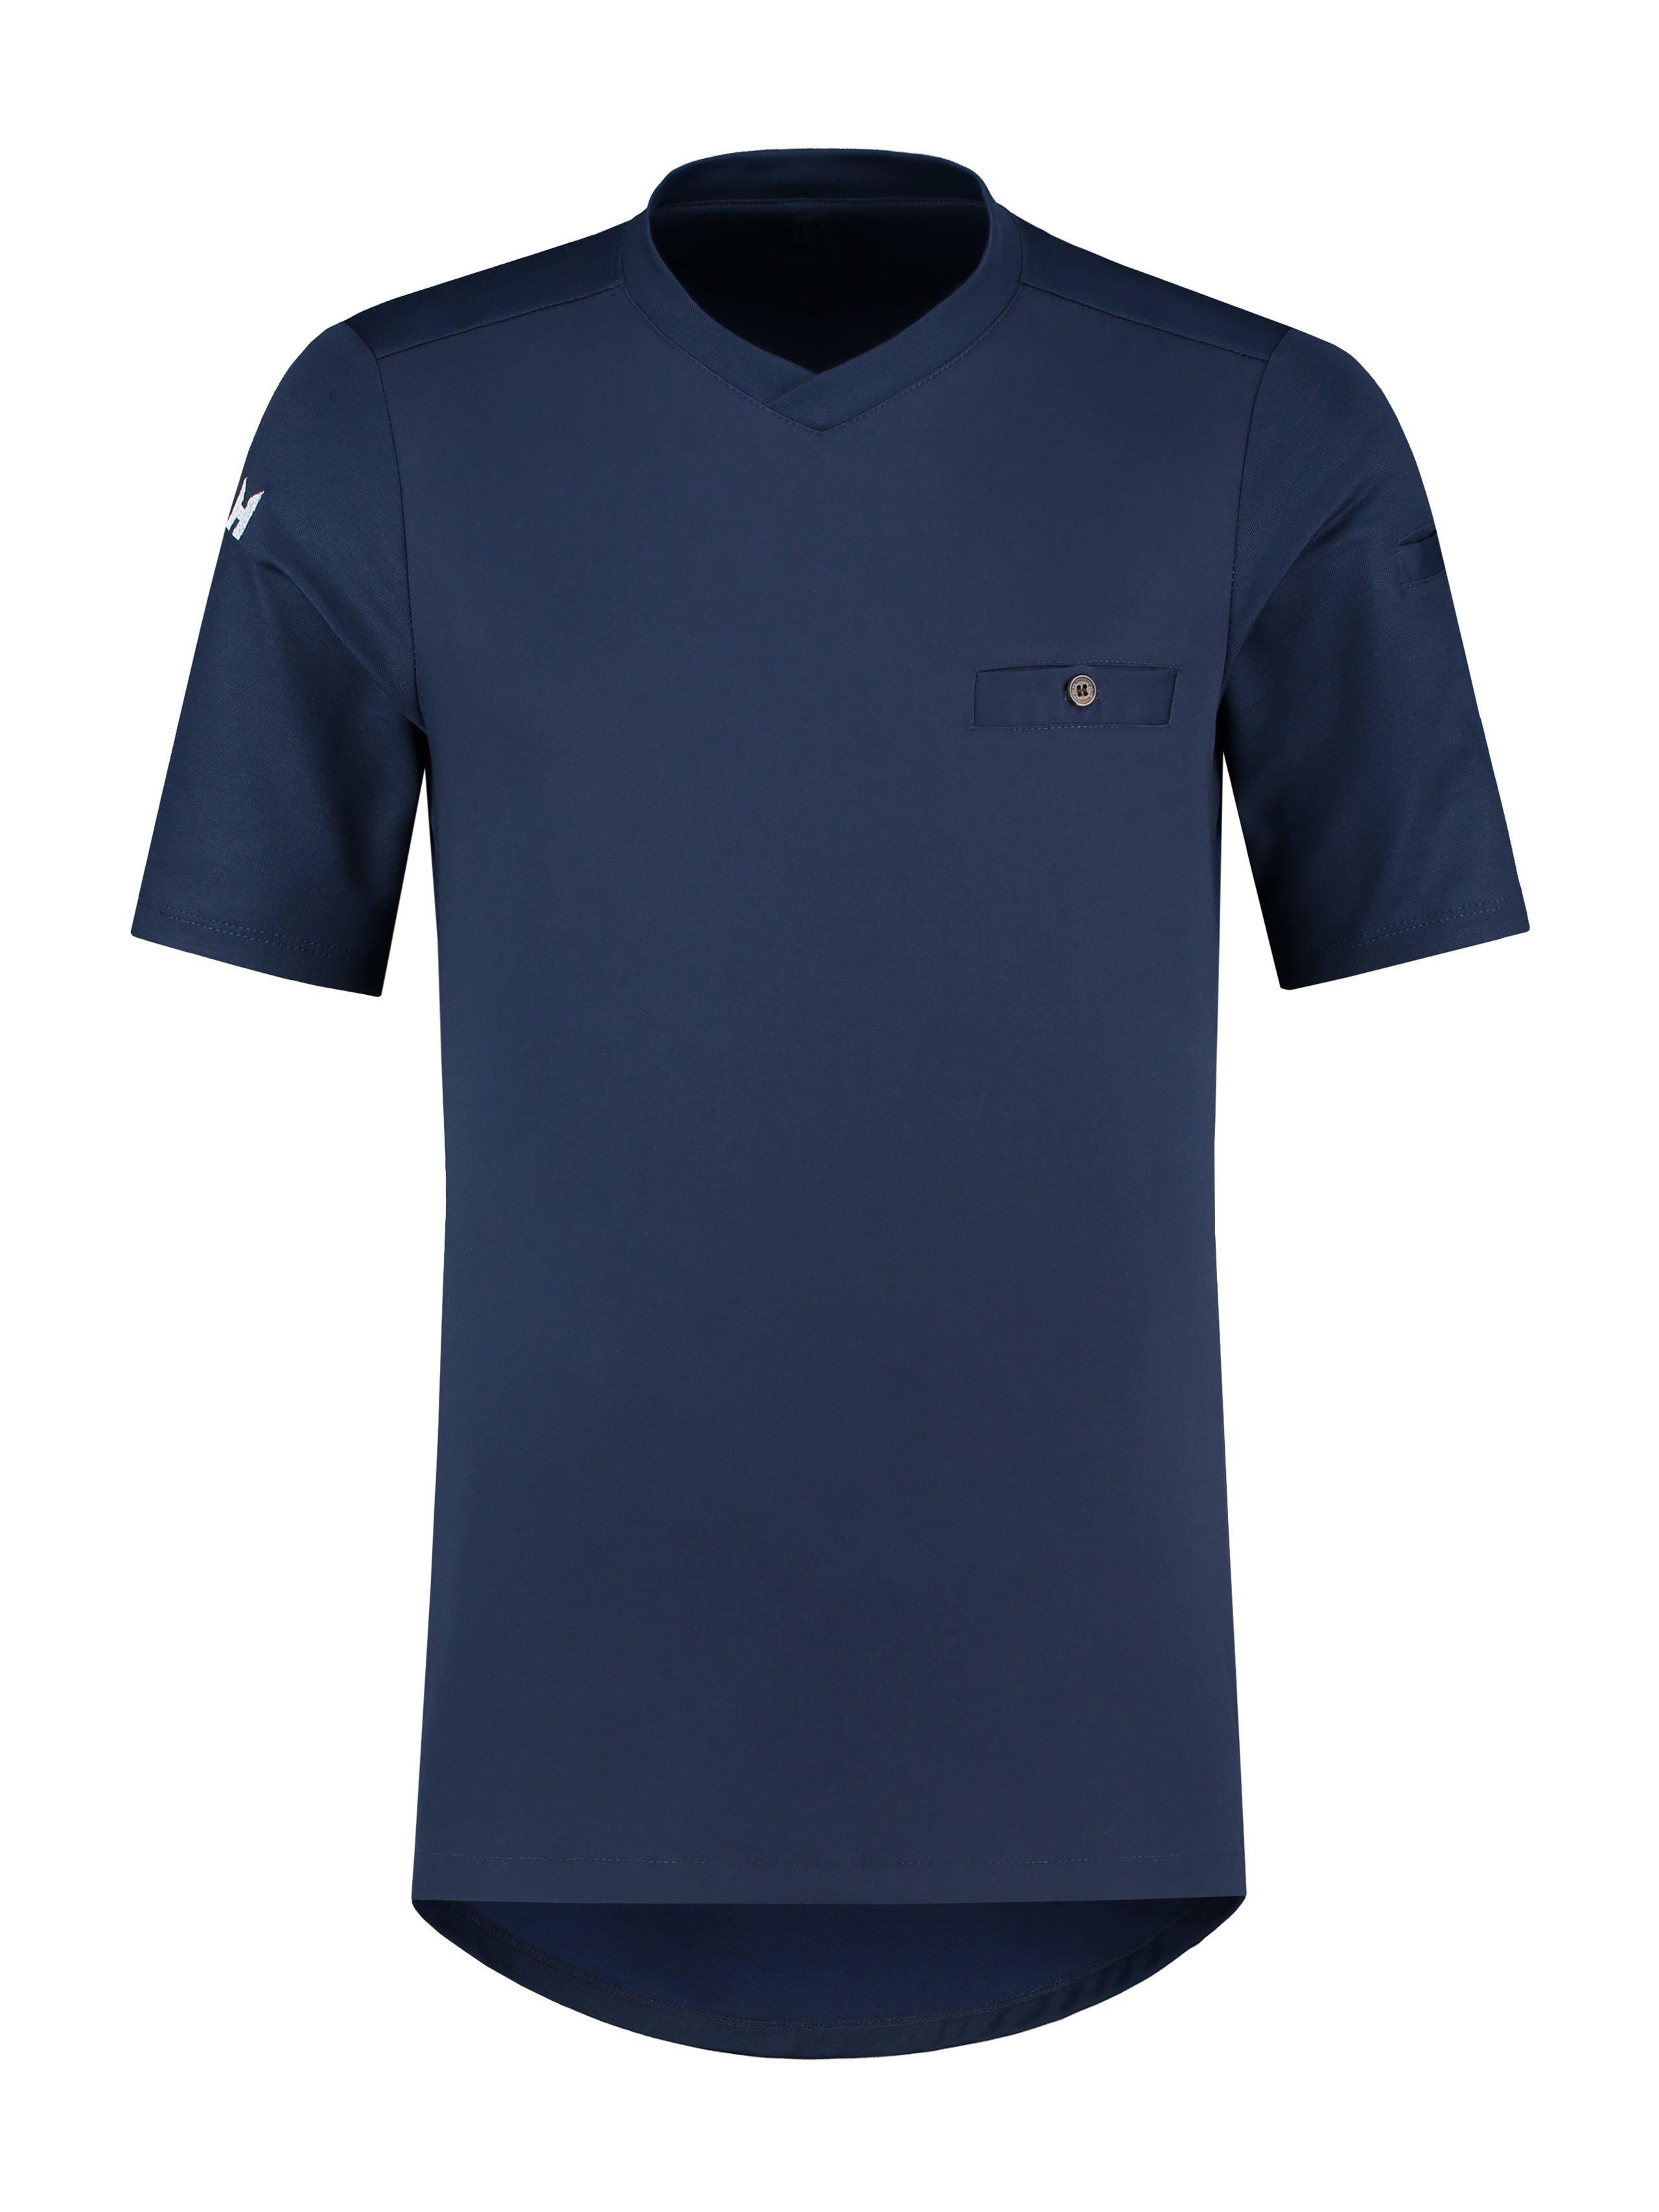 Chef Jacket Ferre Patriot Blue